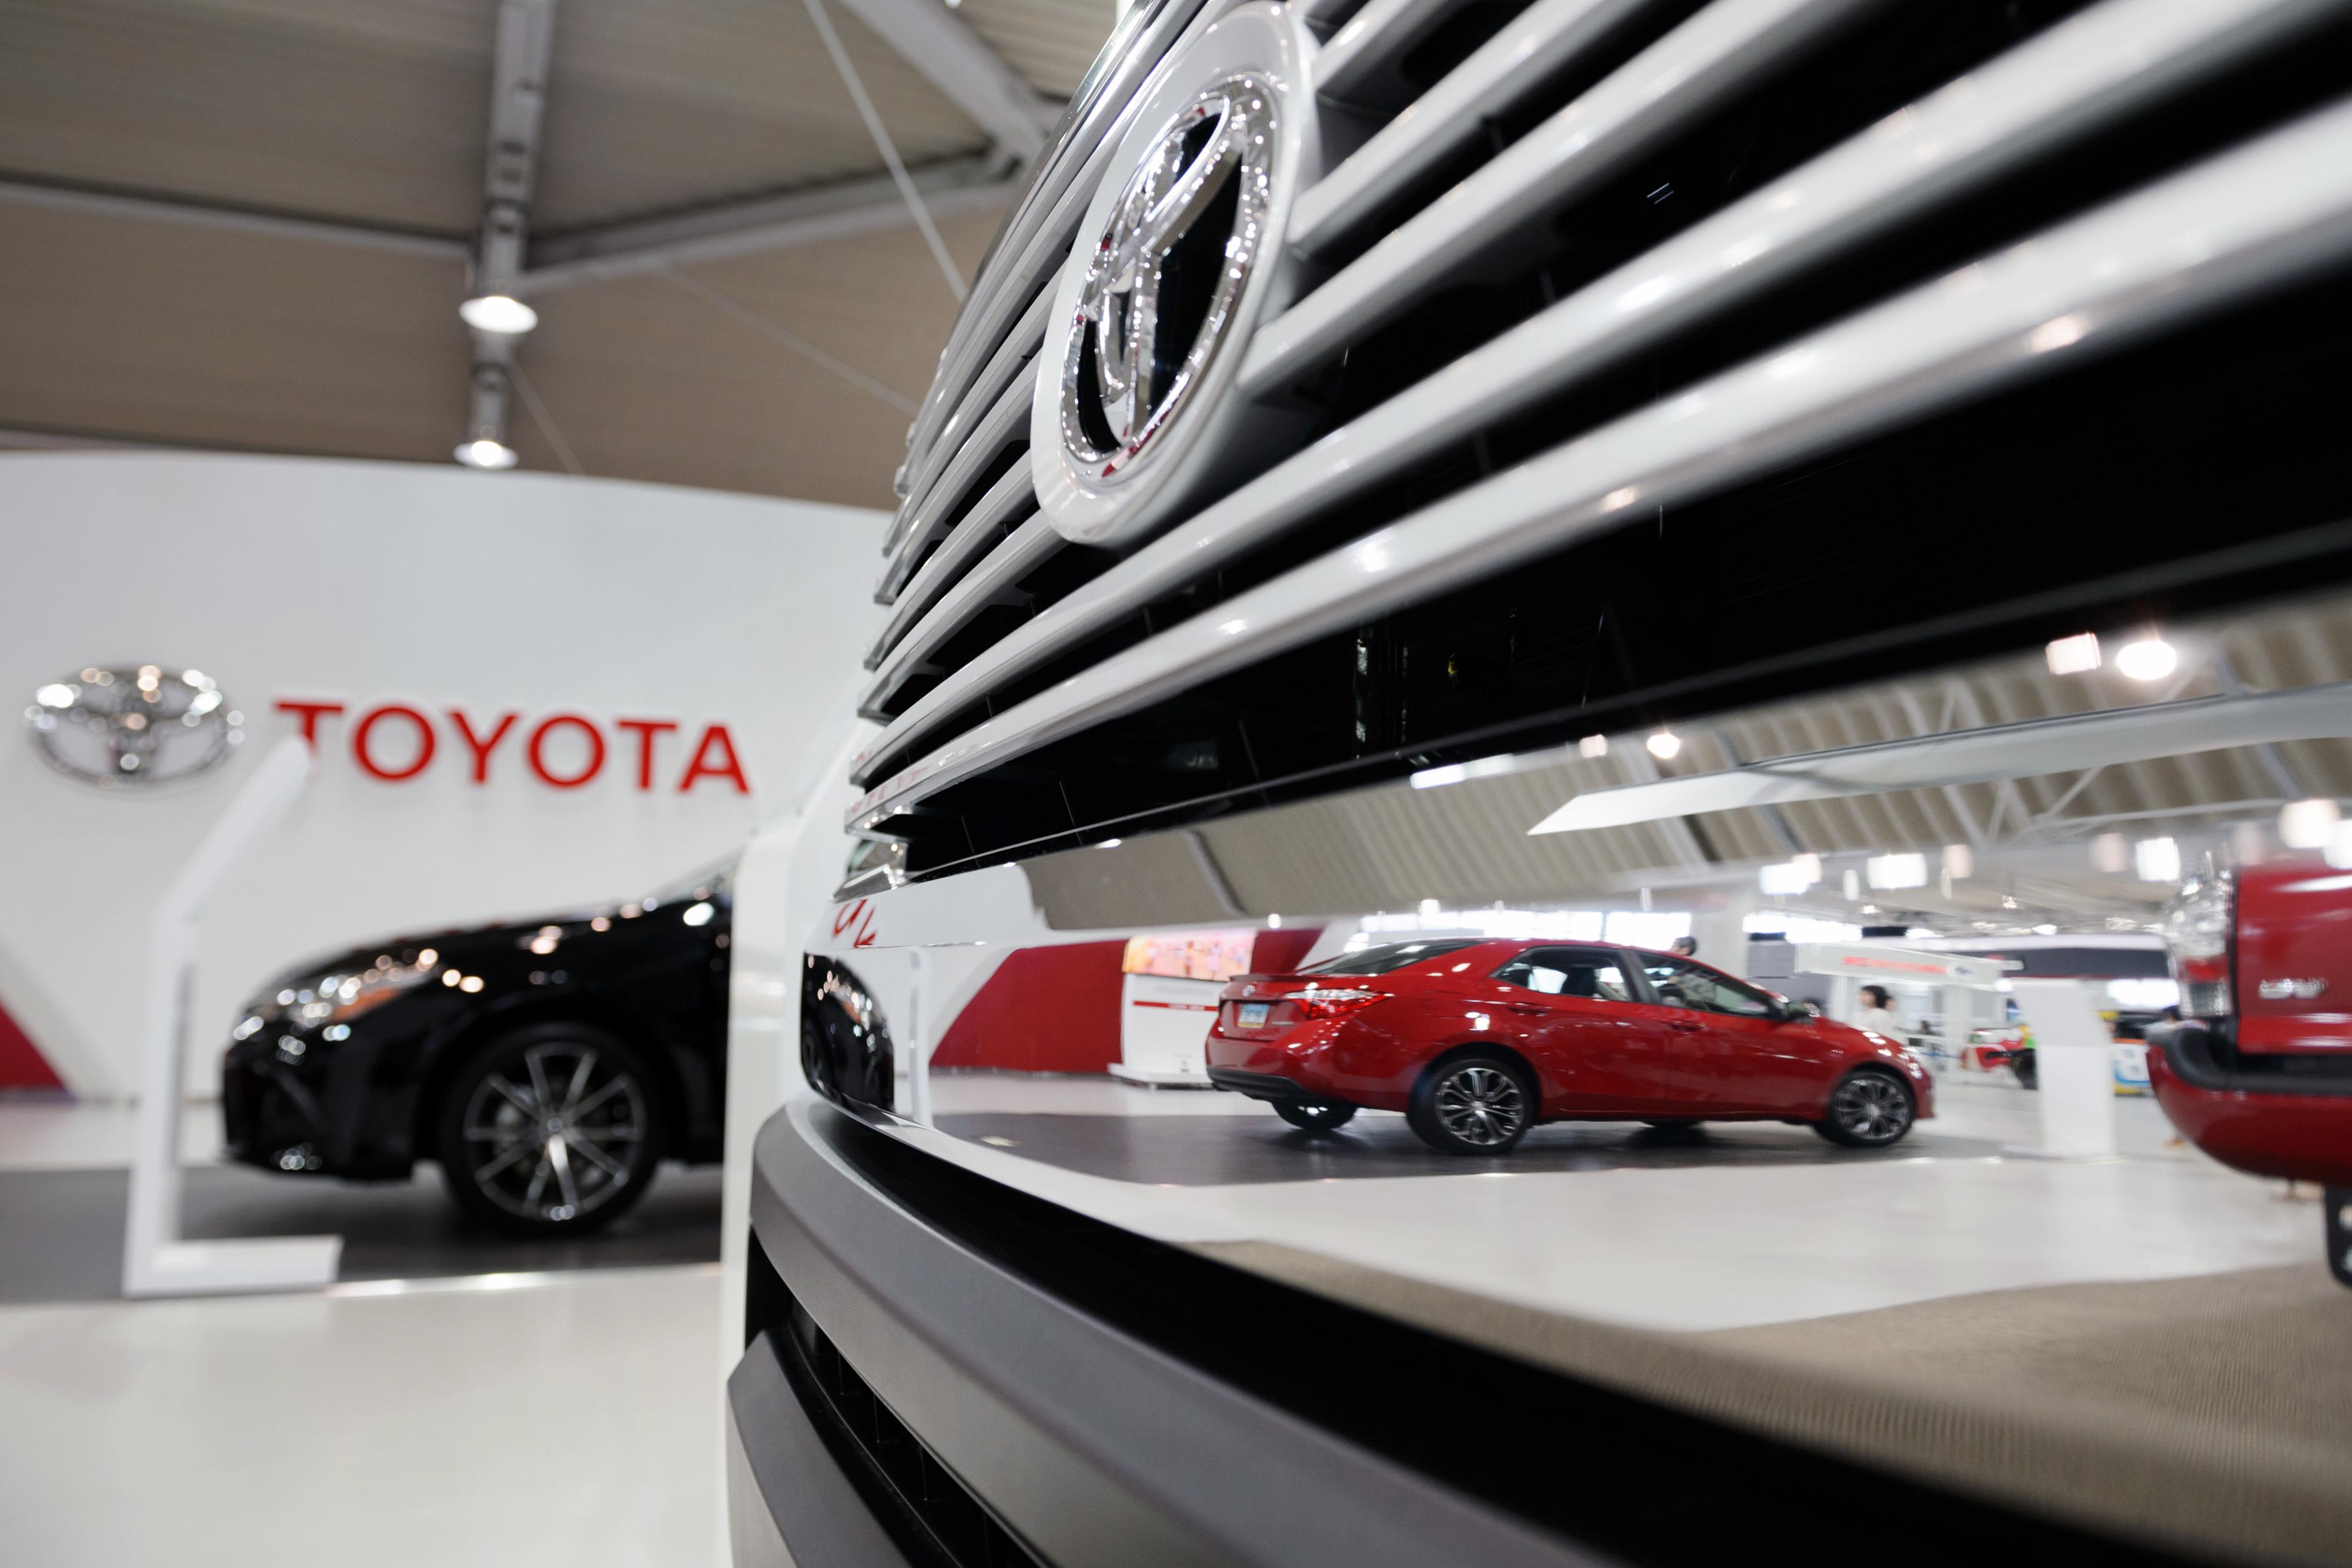 Inside The Toyota Megaweb Showroom Ahead Of Company Earnings